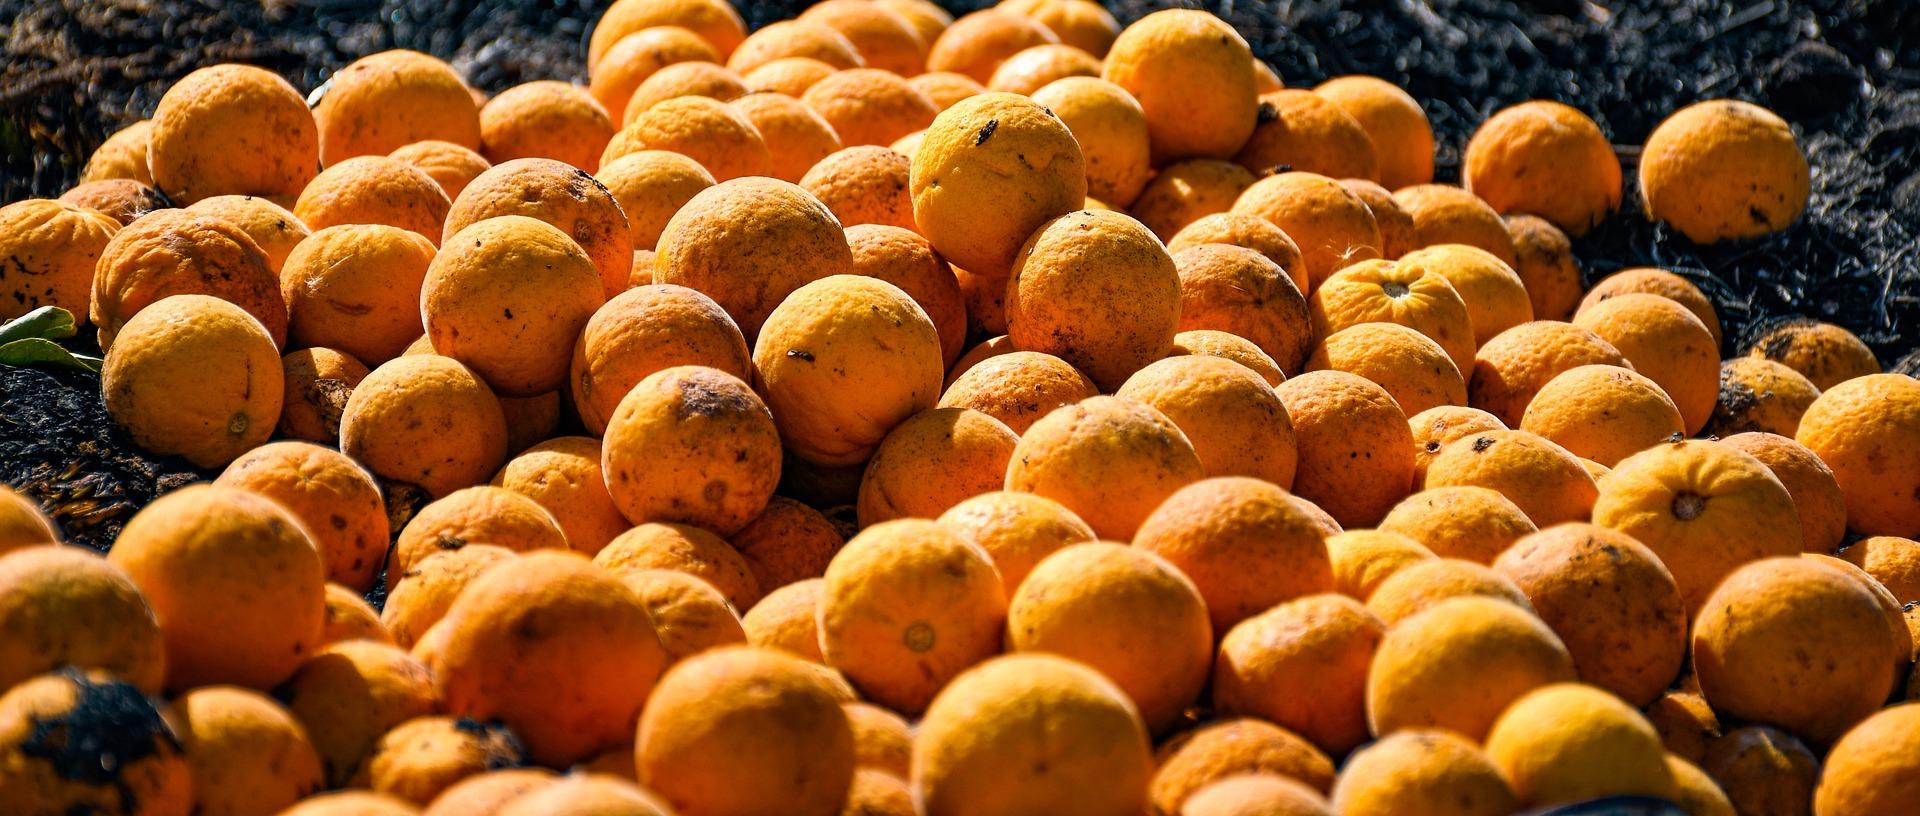 fruit-5030091_1920